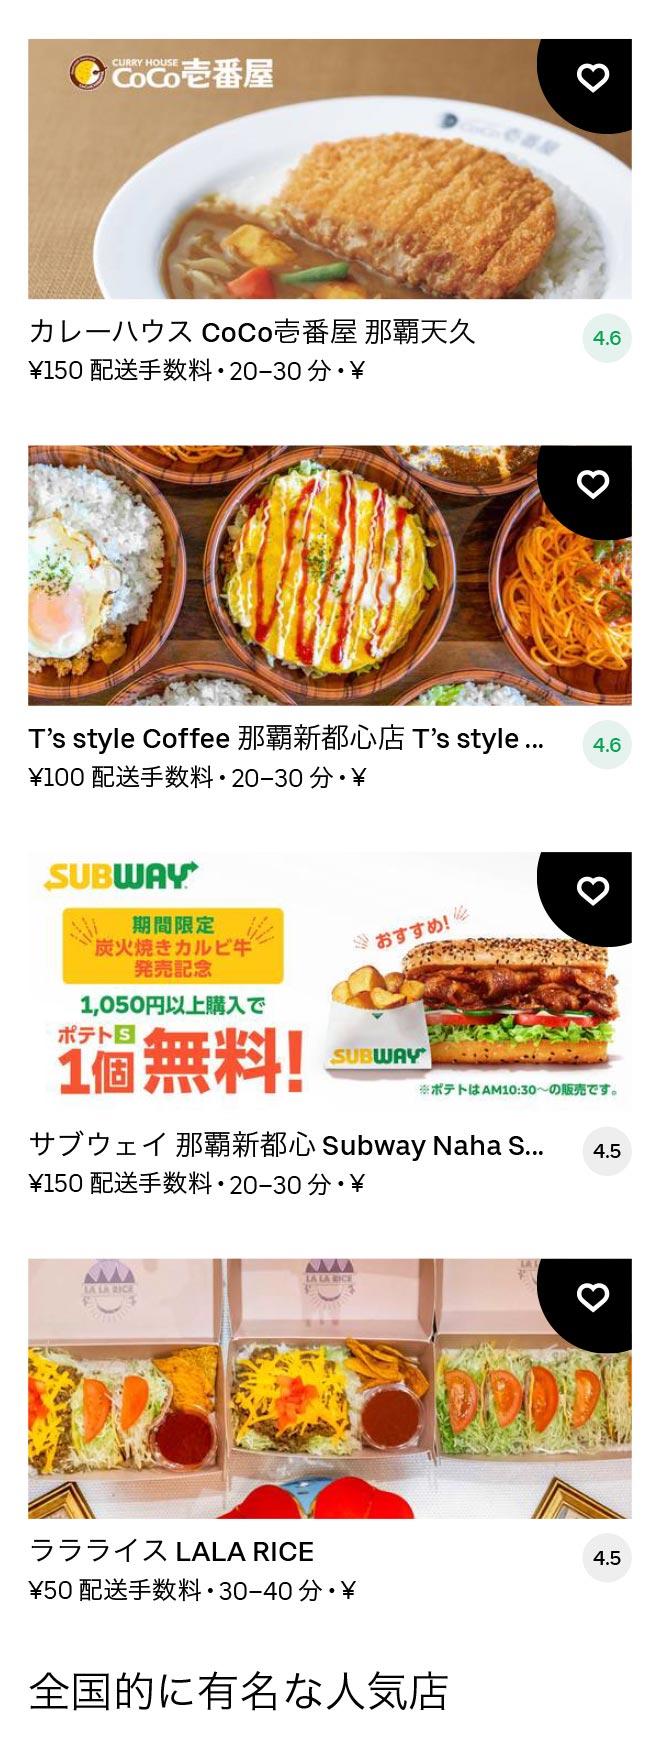 O kenchomae menu 2011 06